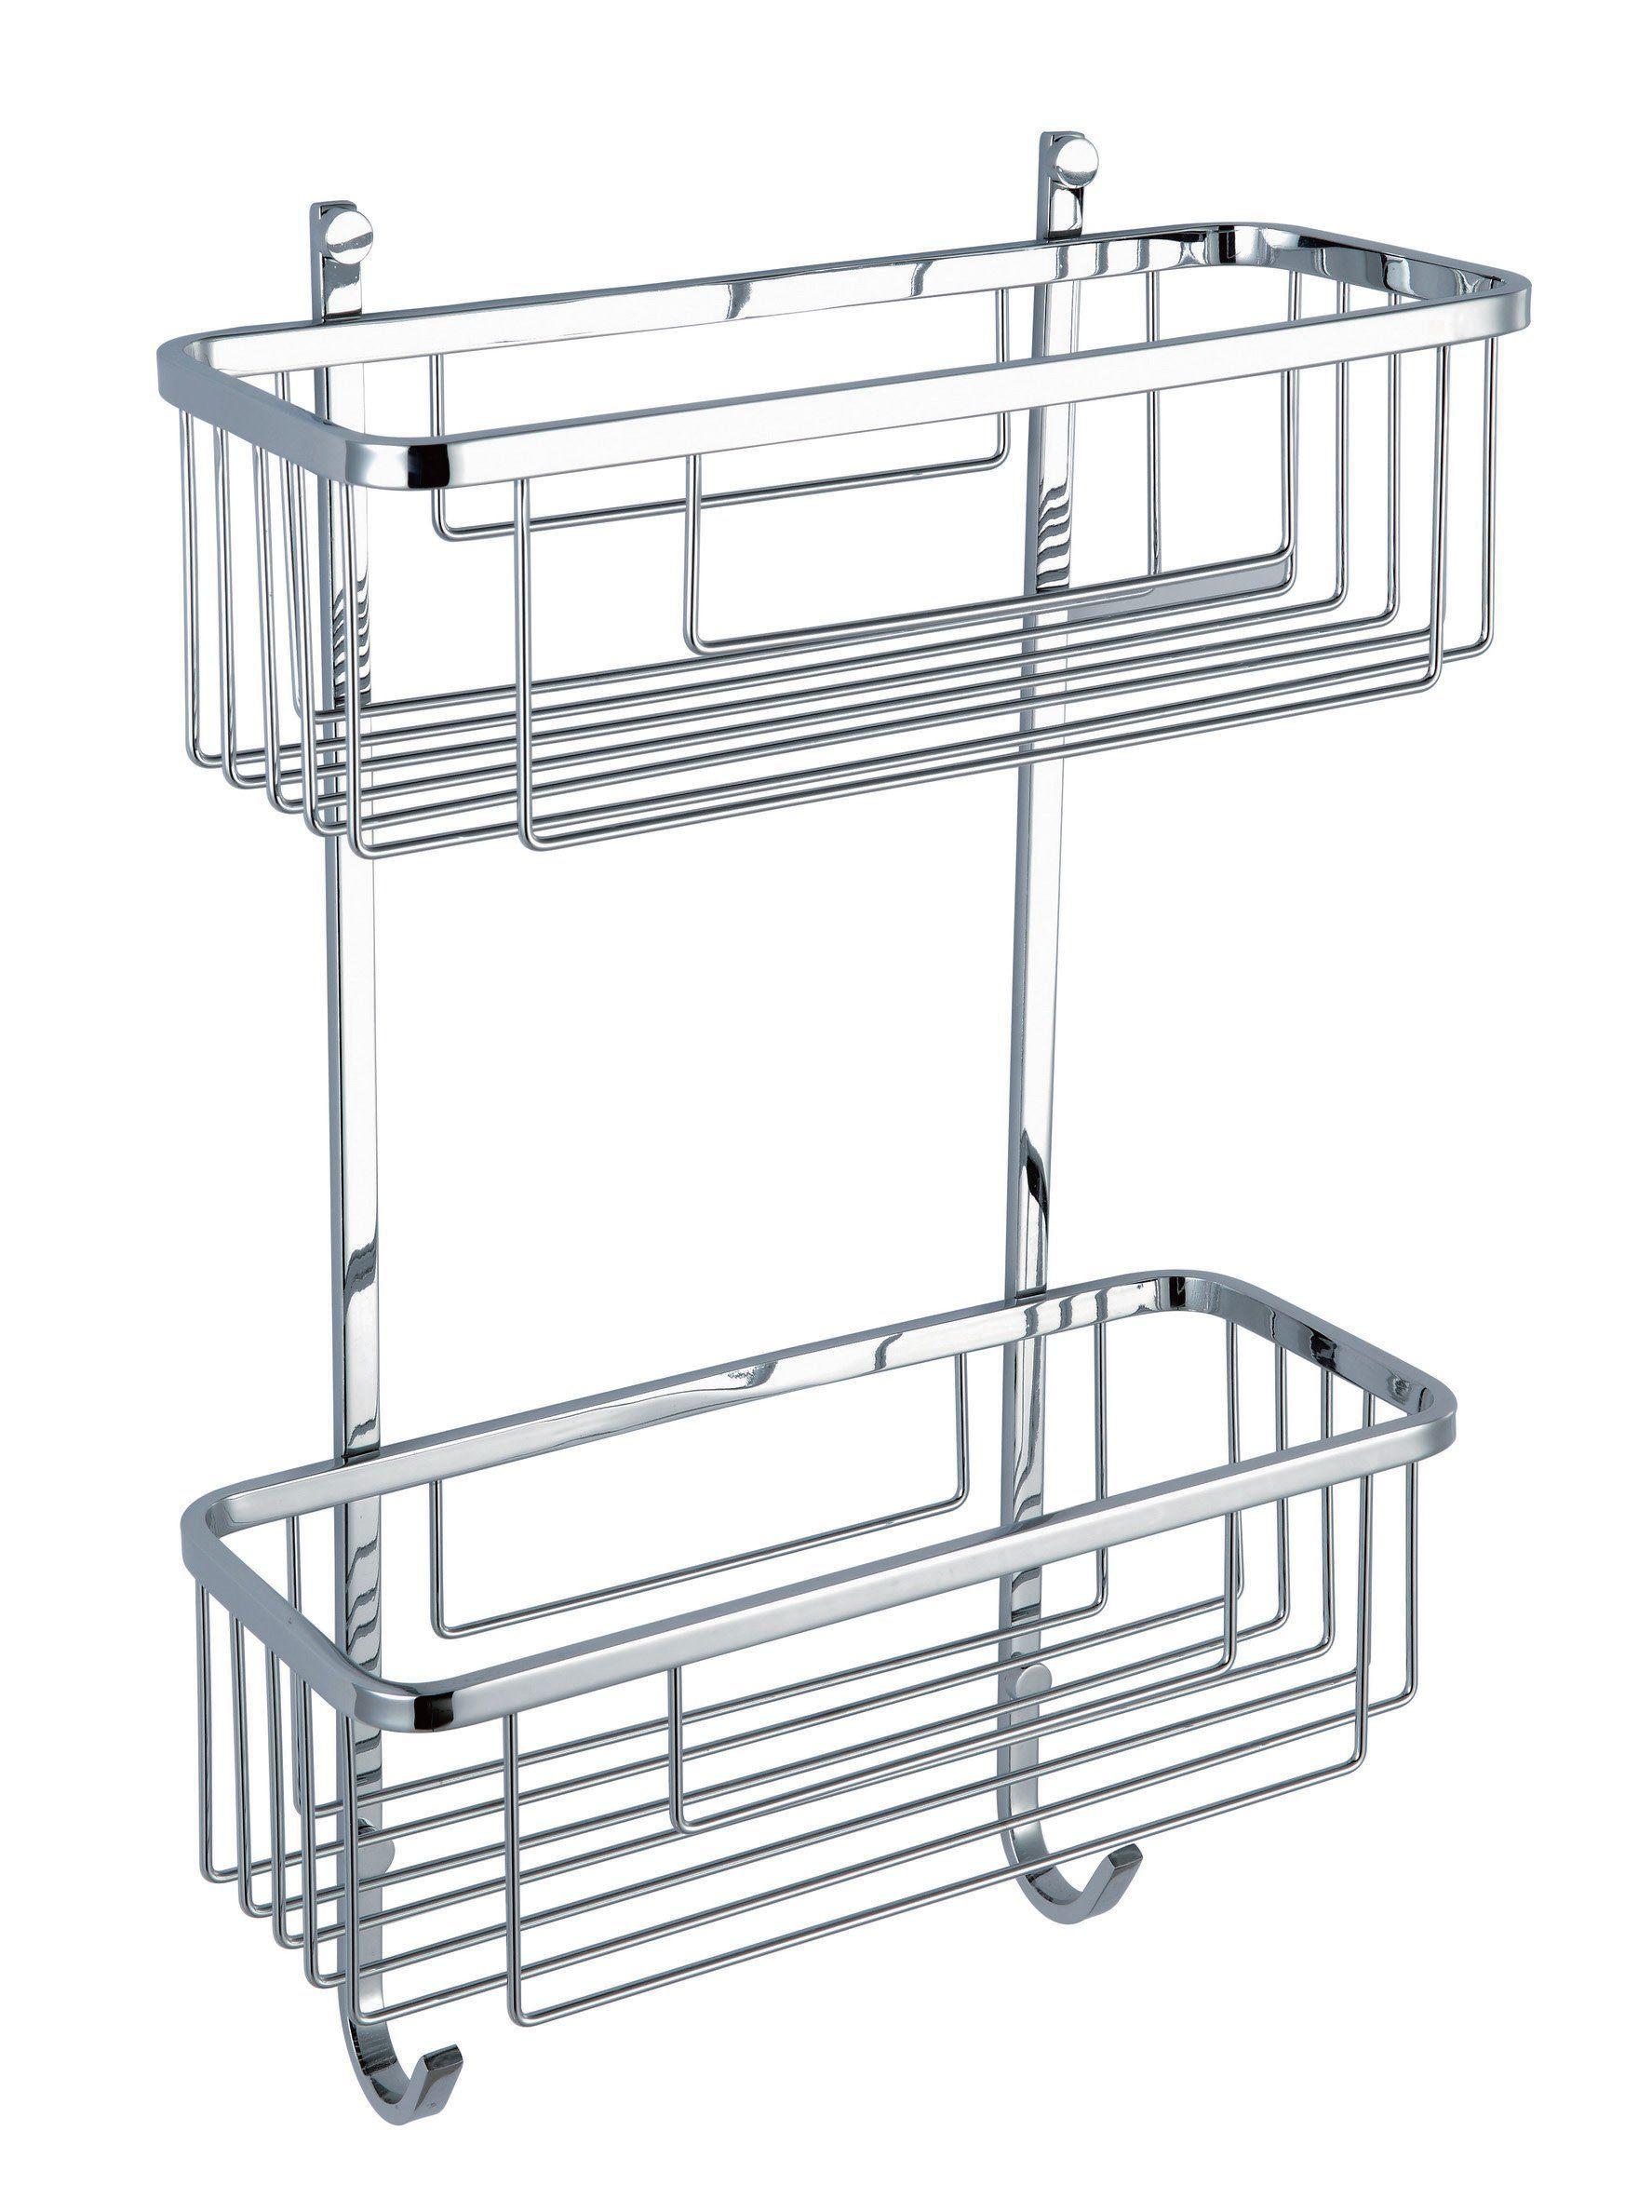 Hane 2 Tiers Stainless Steel Bathroom Shower Caddy Shelf Basket 09